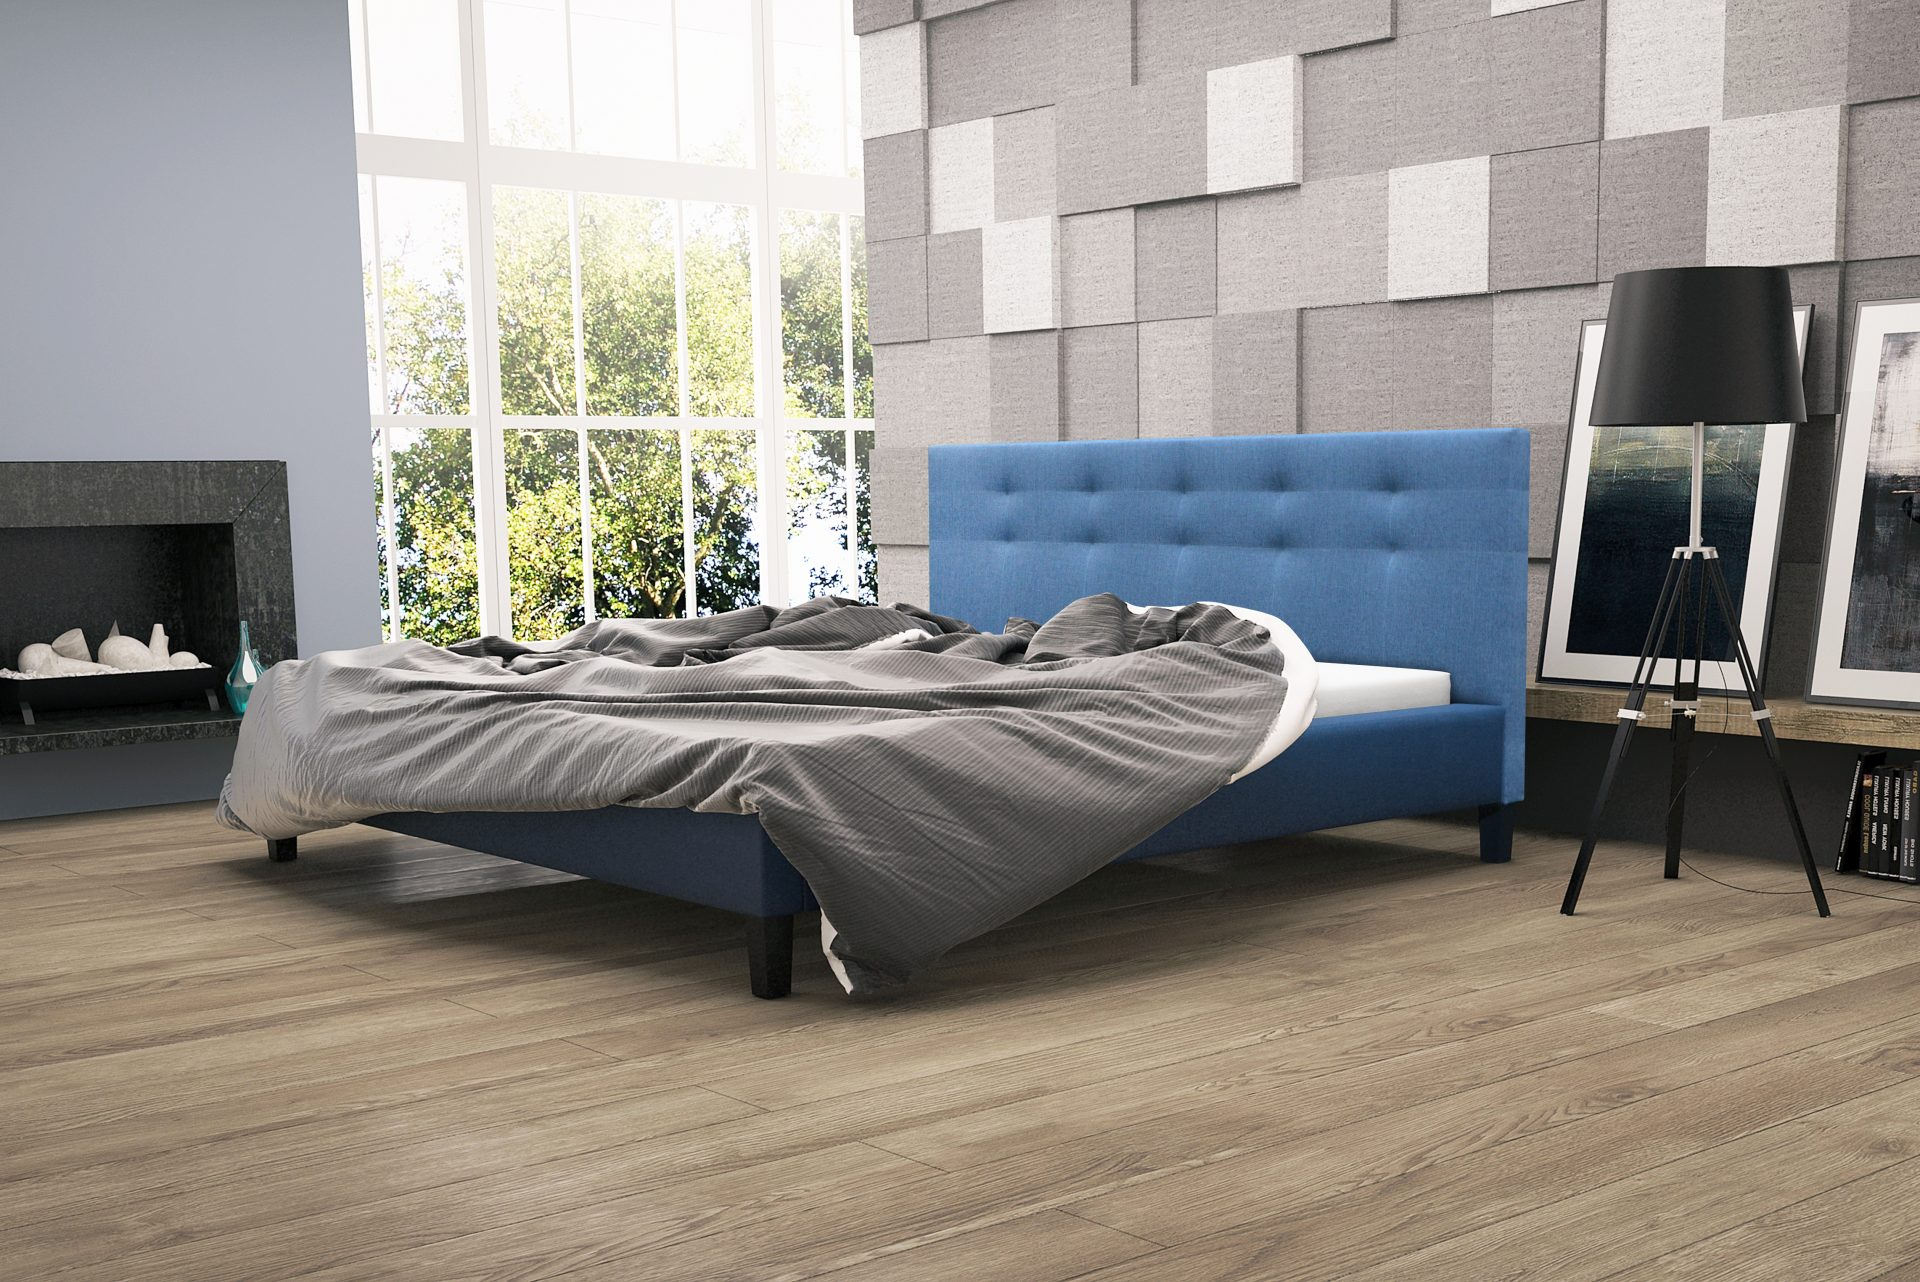 Łóżka tapicerowane z materacem